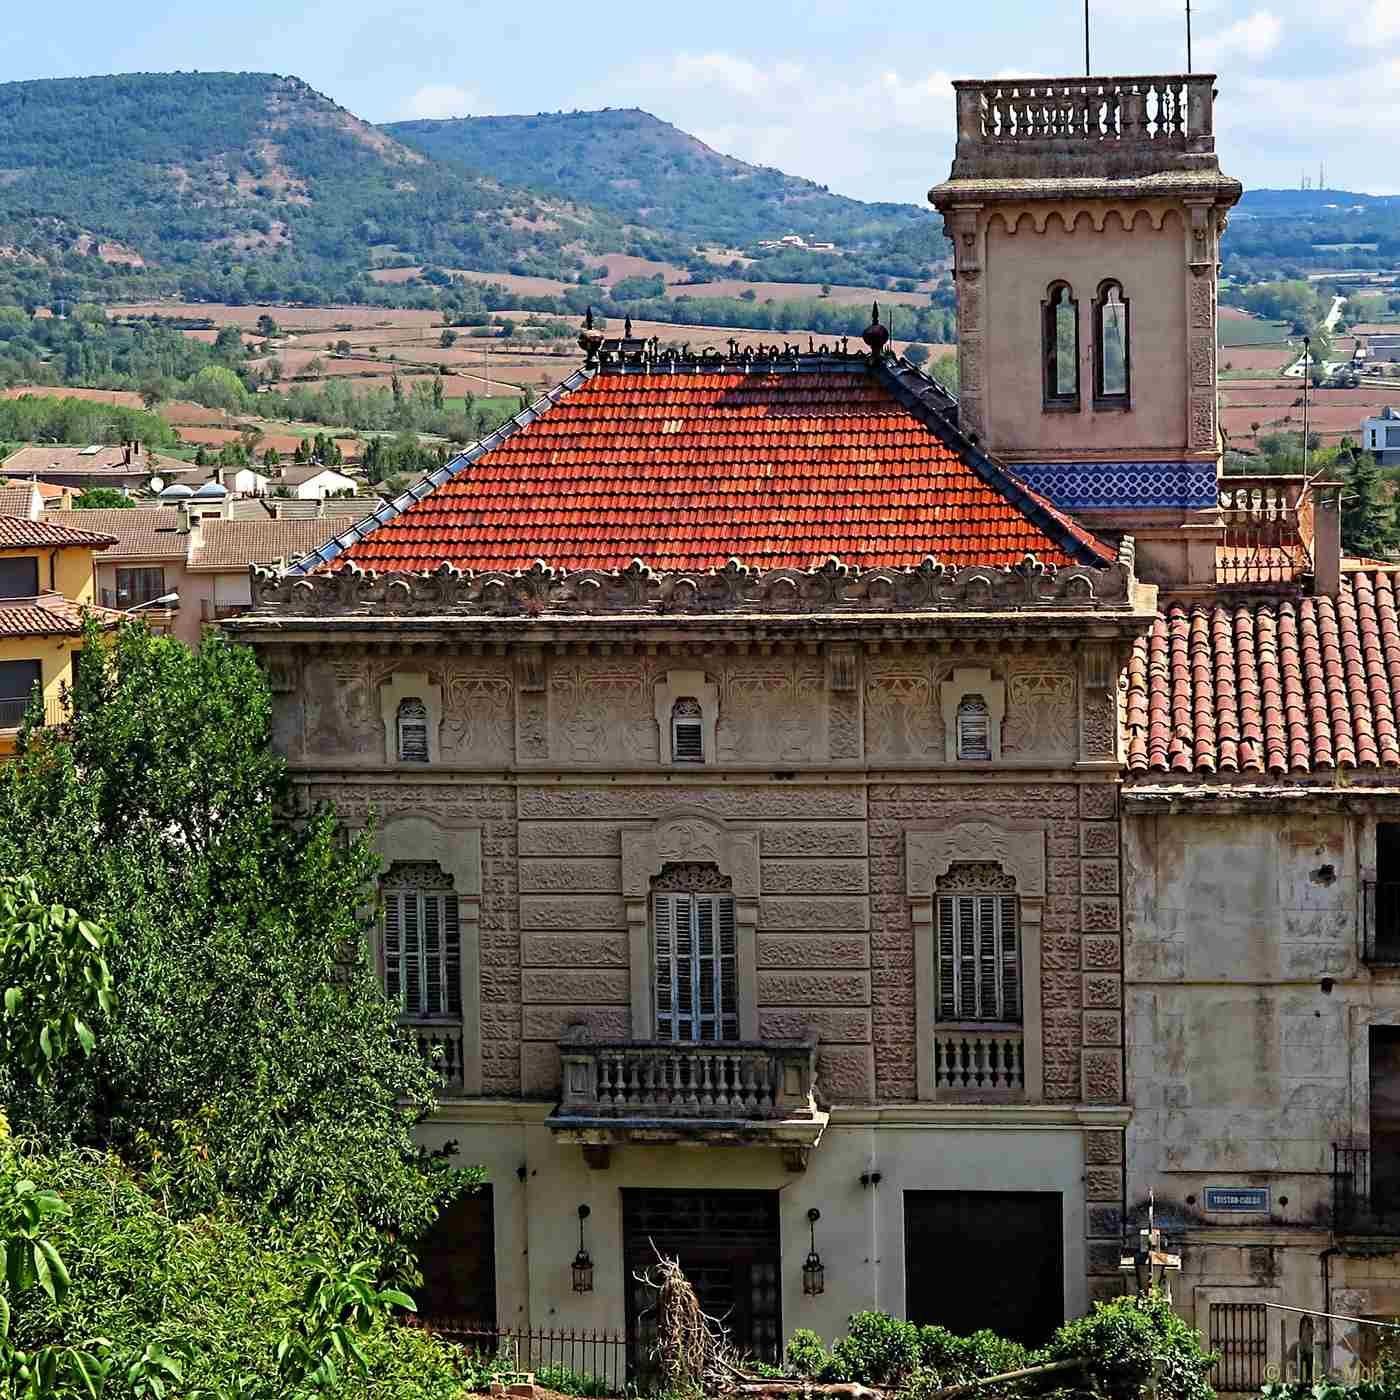 edifici-palauet-tenor-viñasCIC_09092015-6851